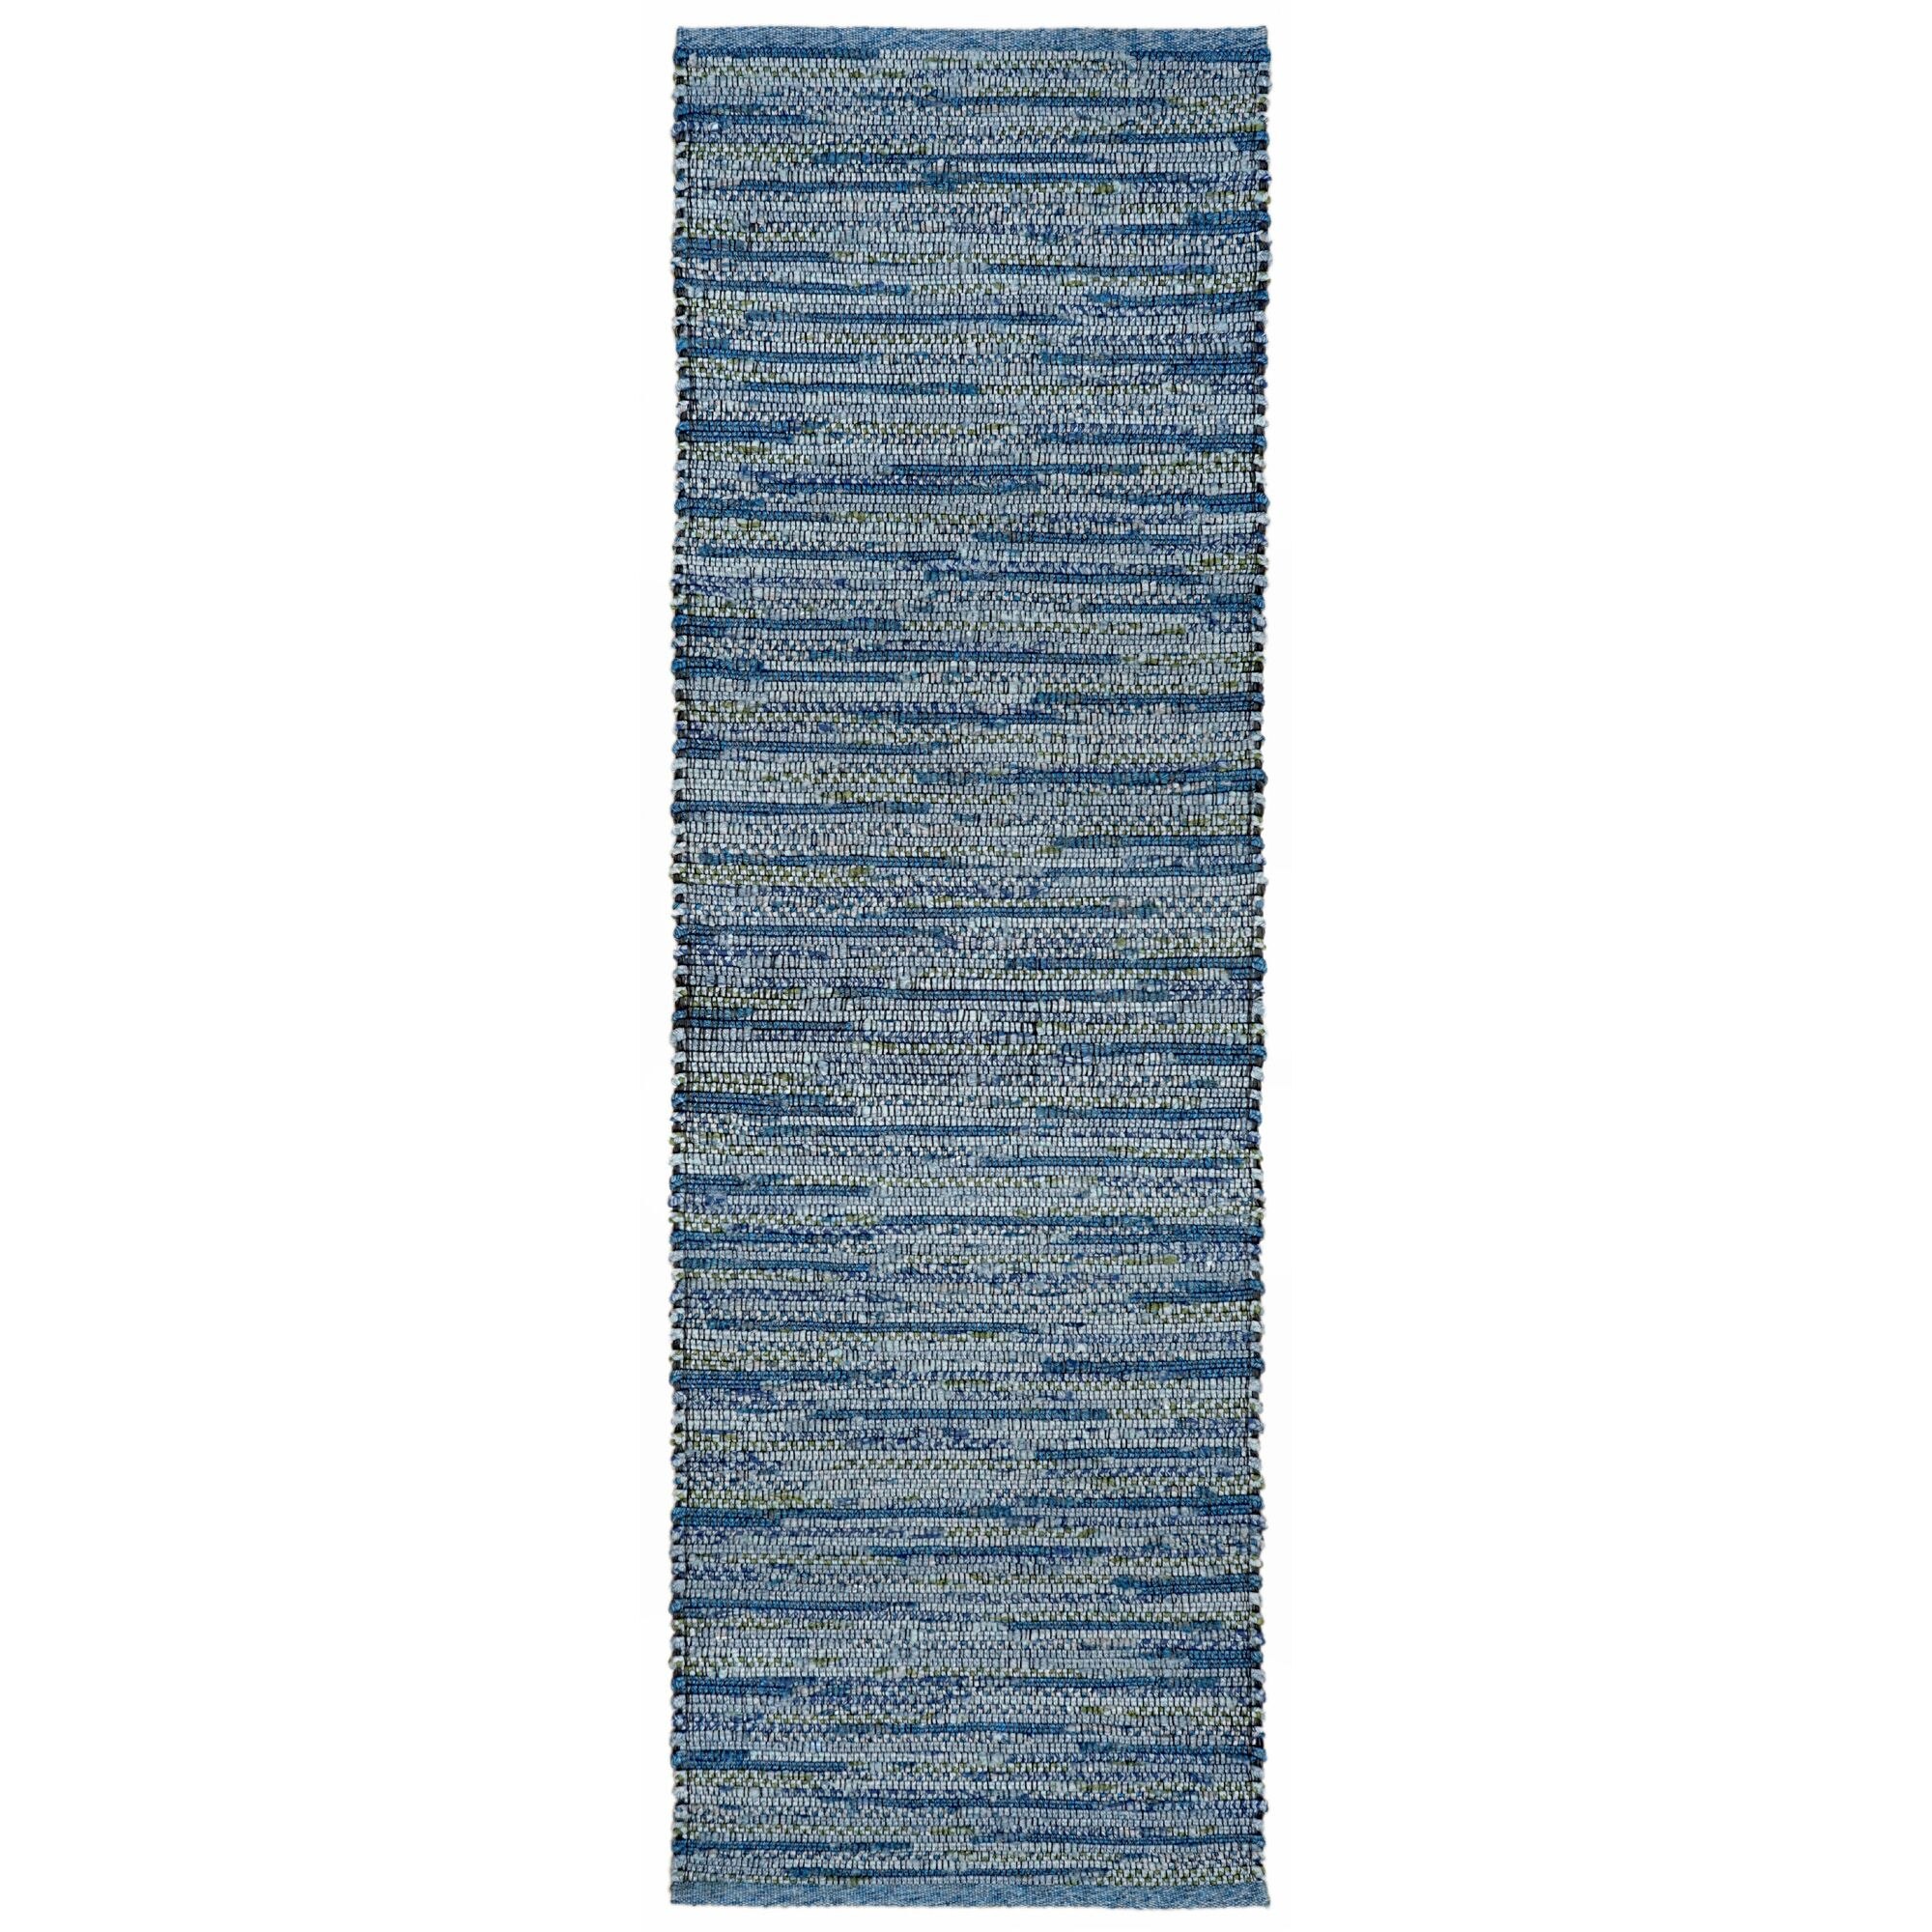 Sardis Hand-Woven Blue Indoor/Outdoor Area Rug Rug Size: 5' x 7'6